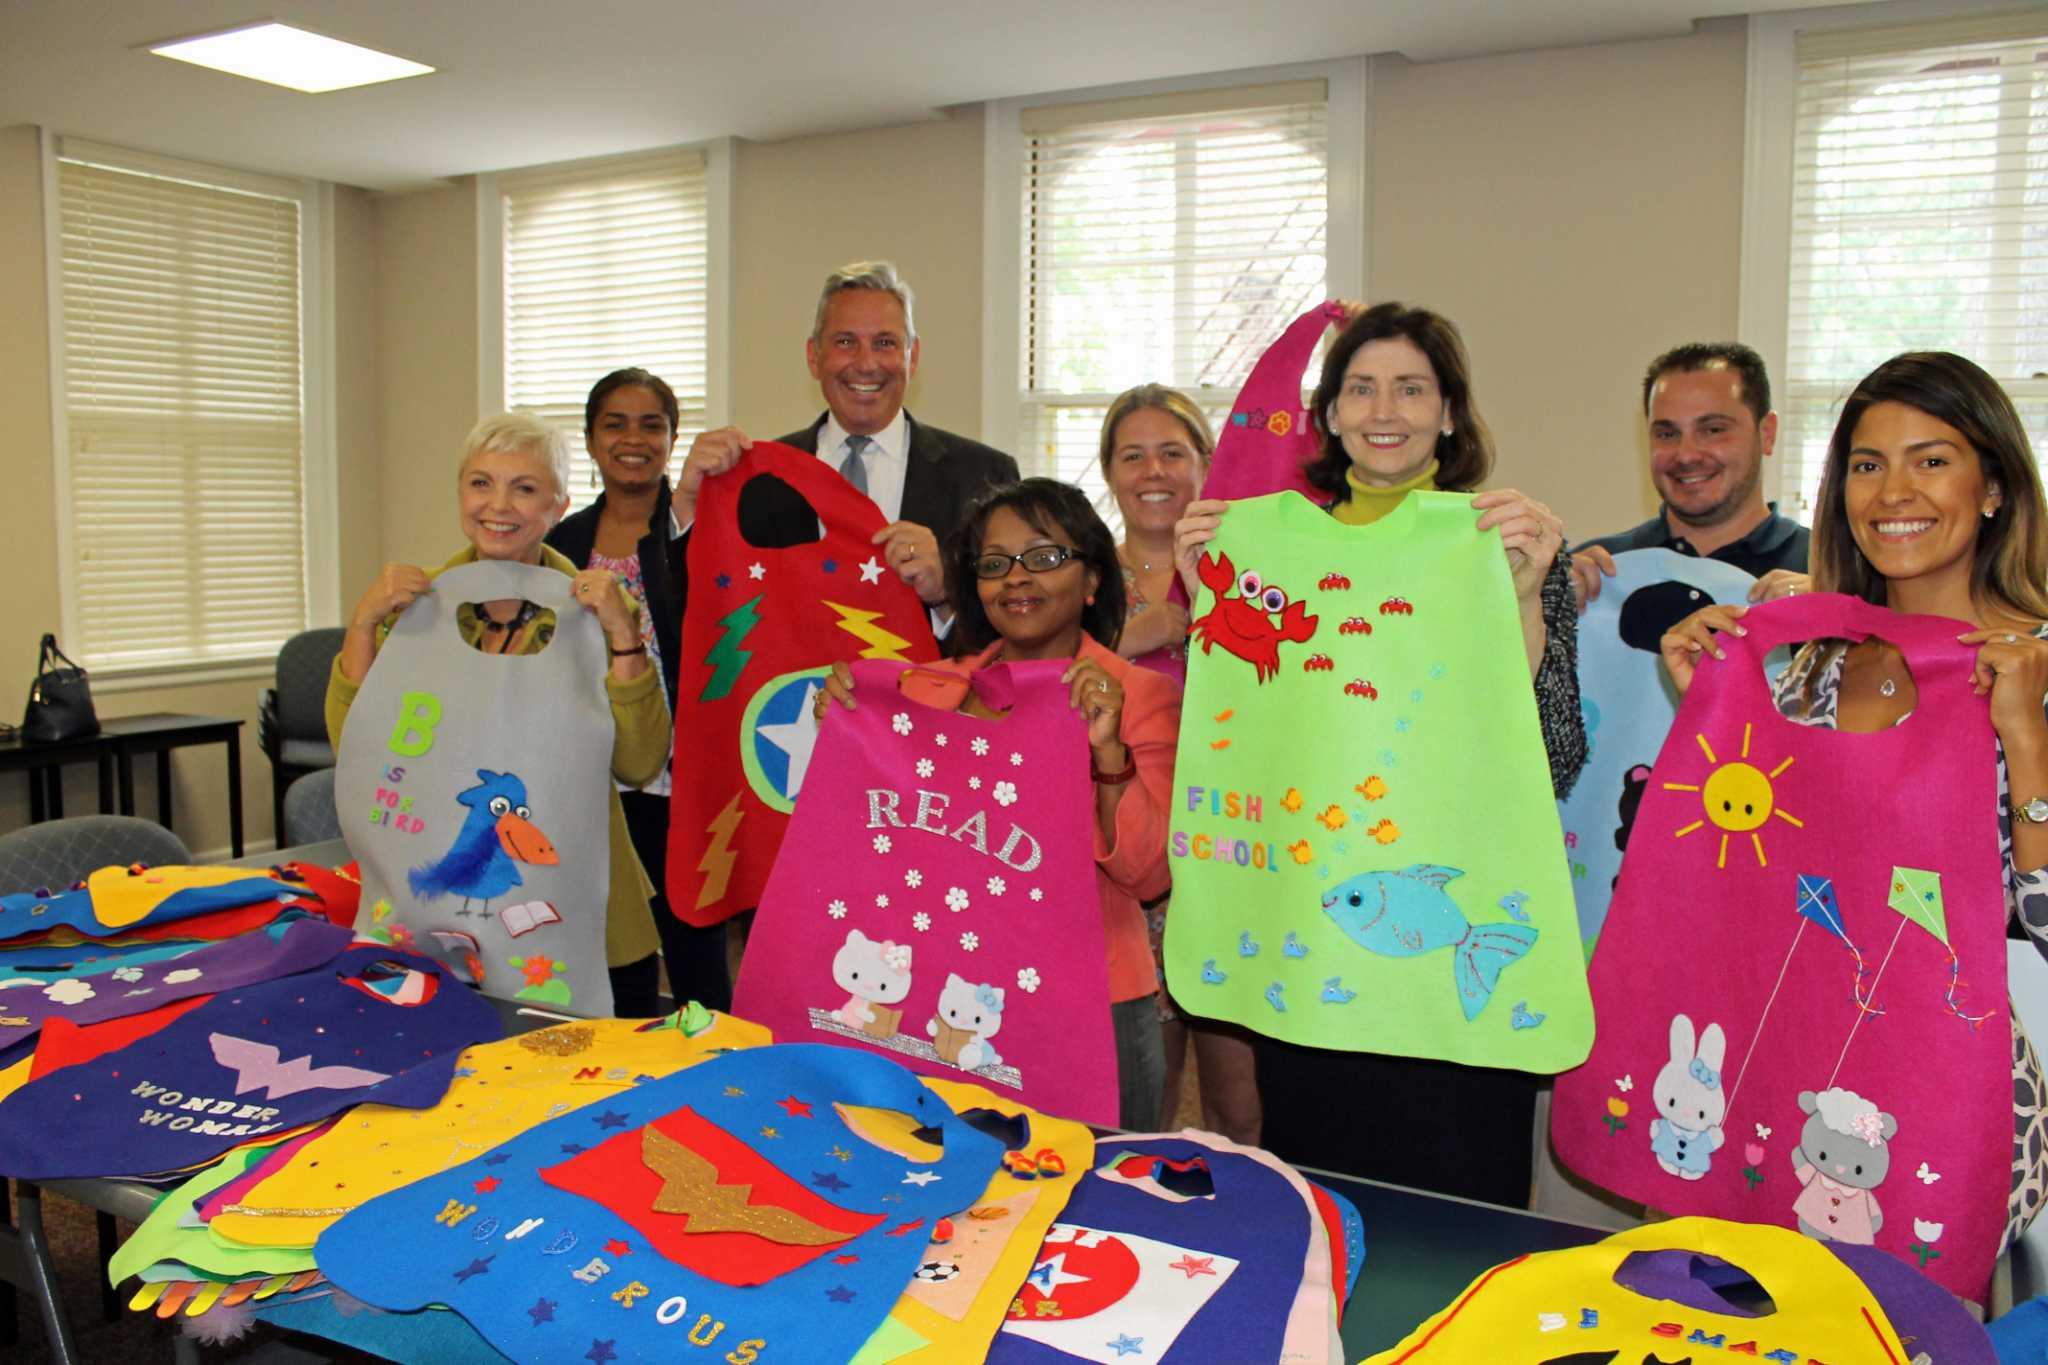 greenwich preschool greenwich preschool offers capes as reading incentive 599